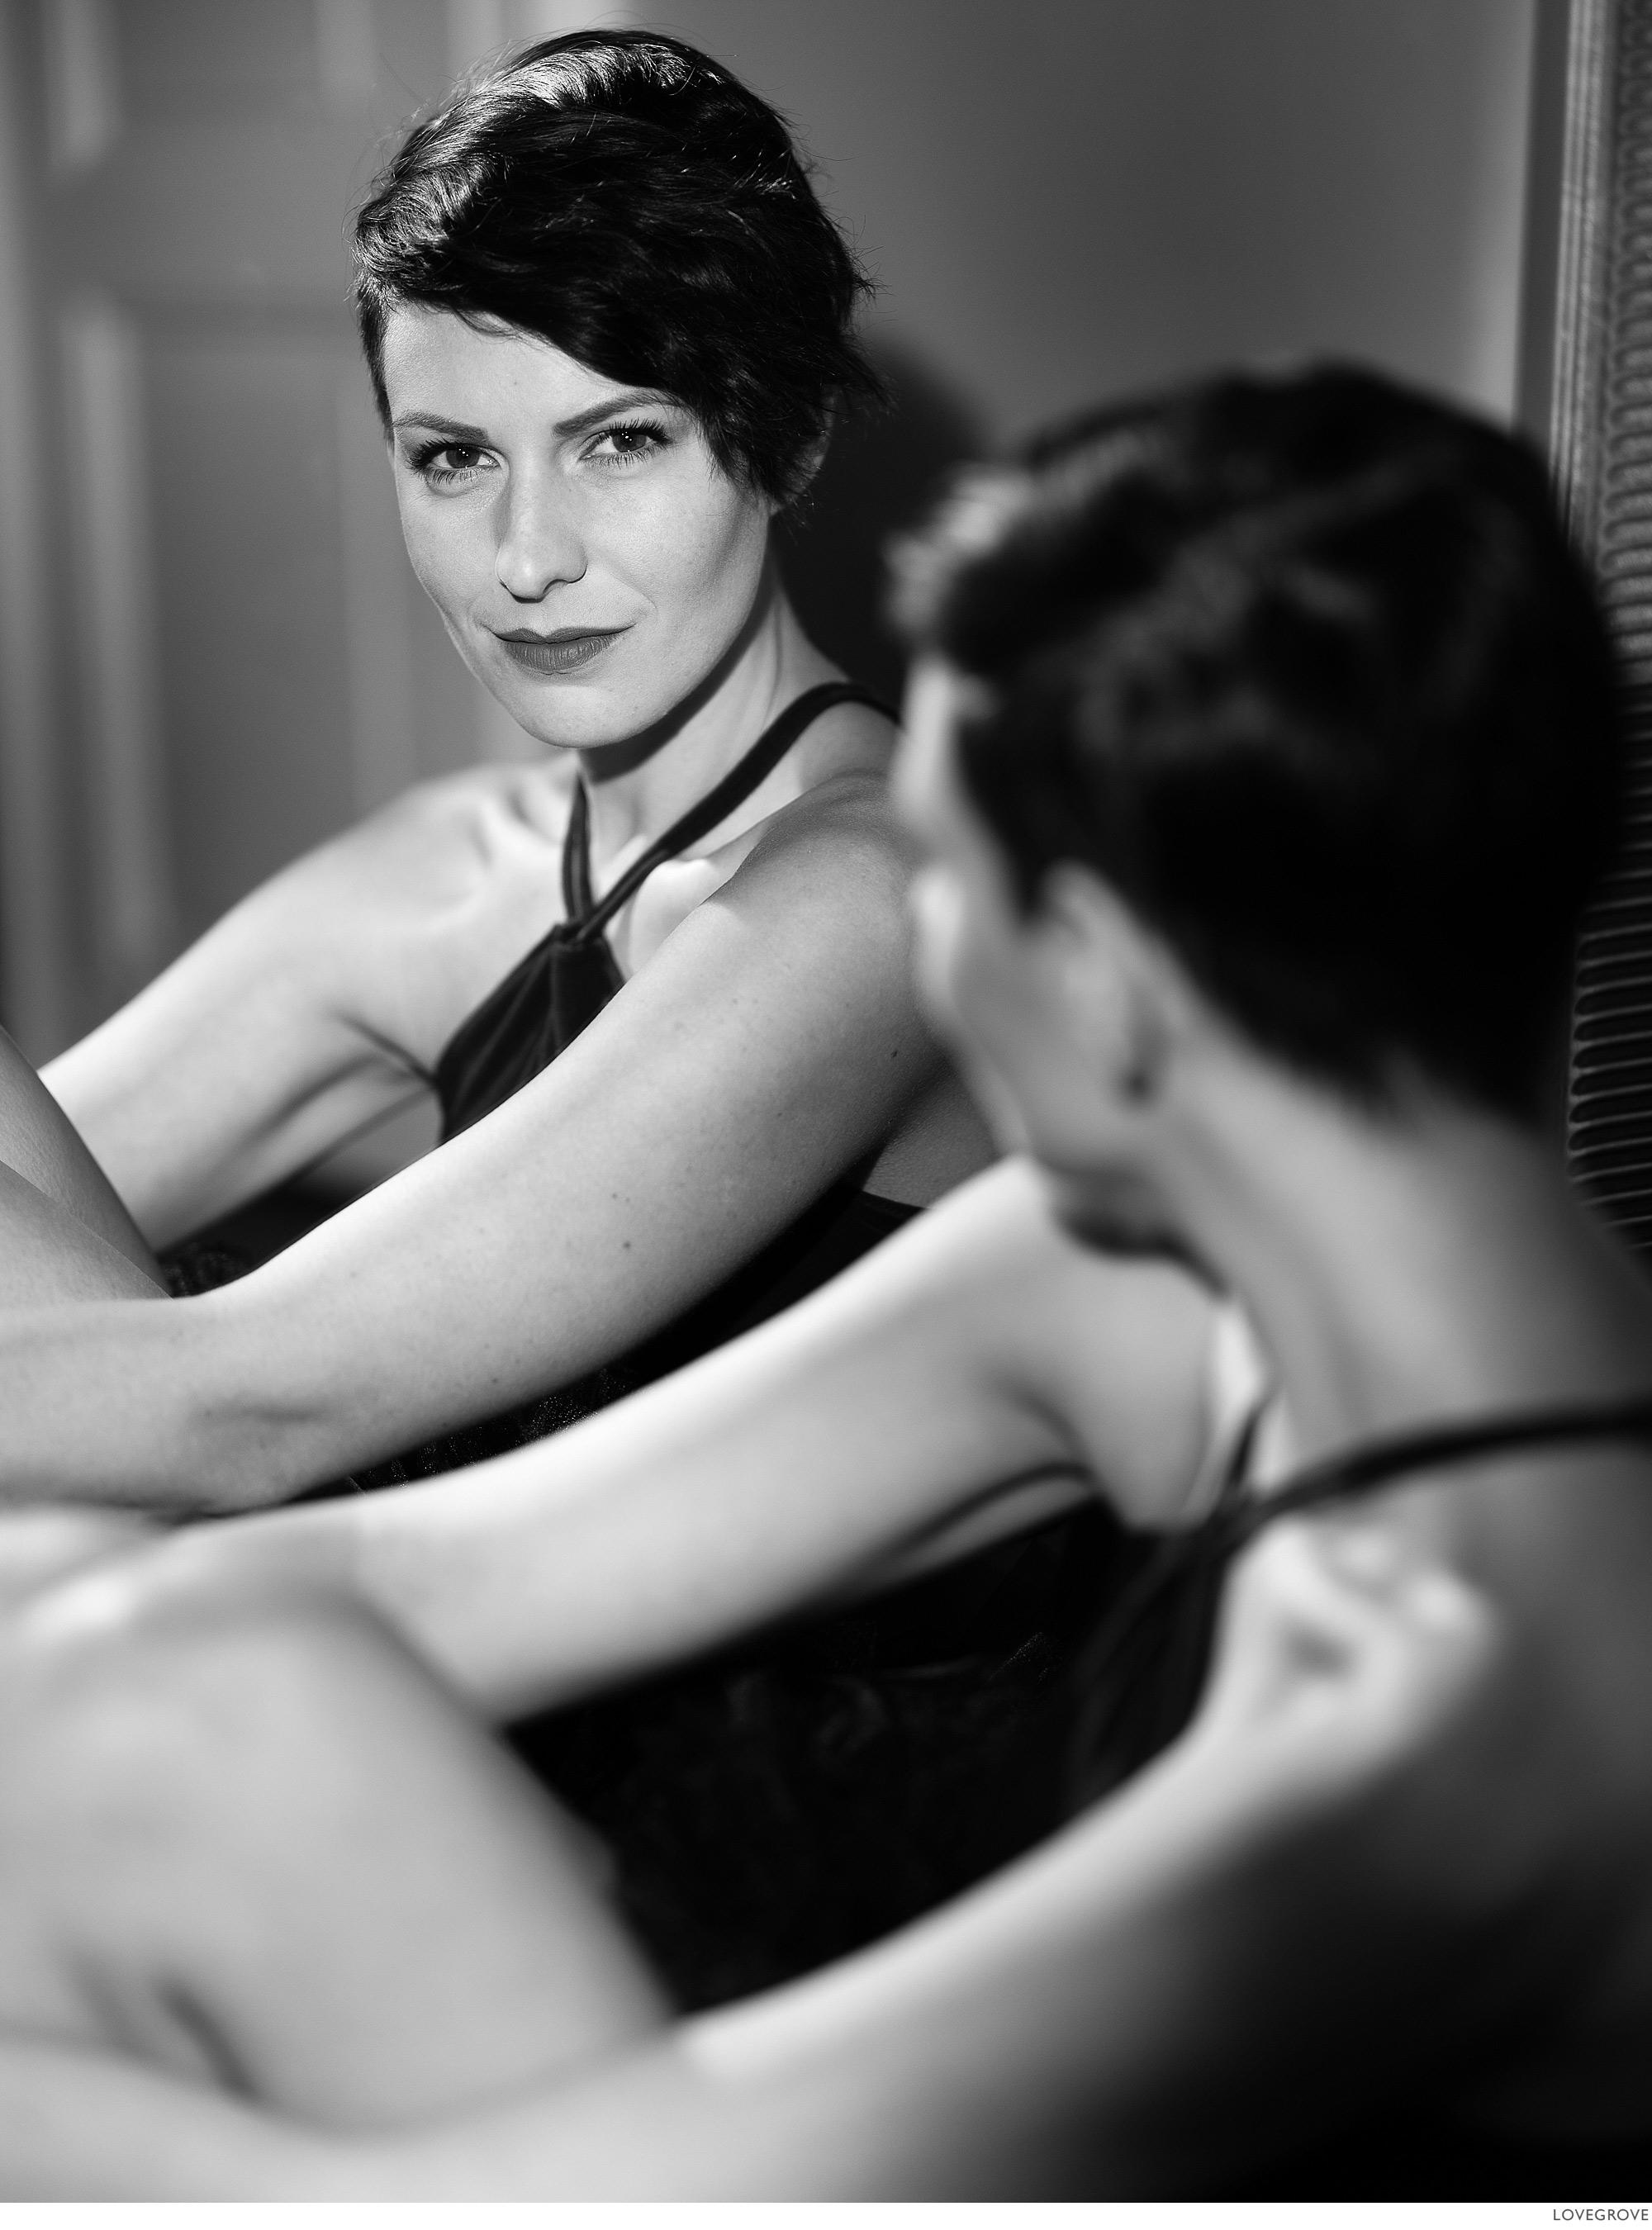 Misha in the mirror